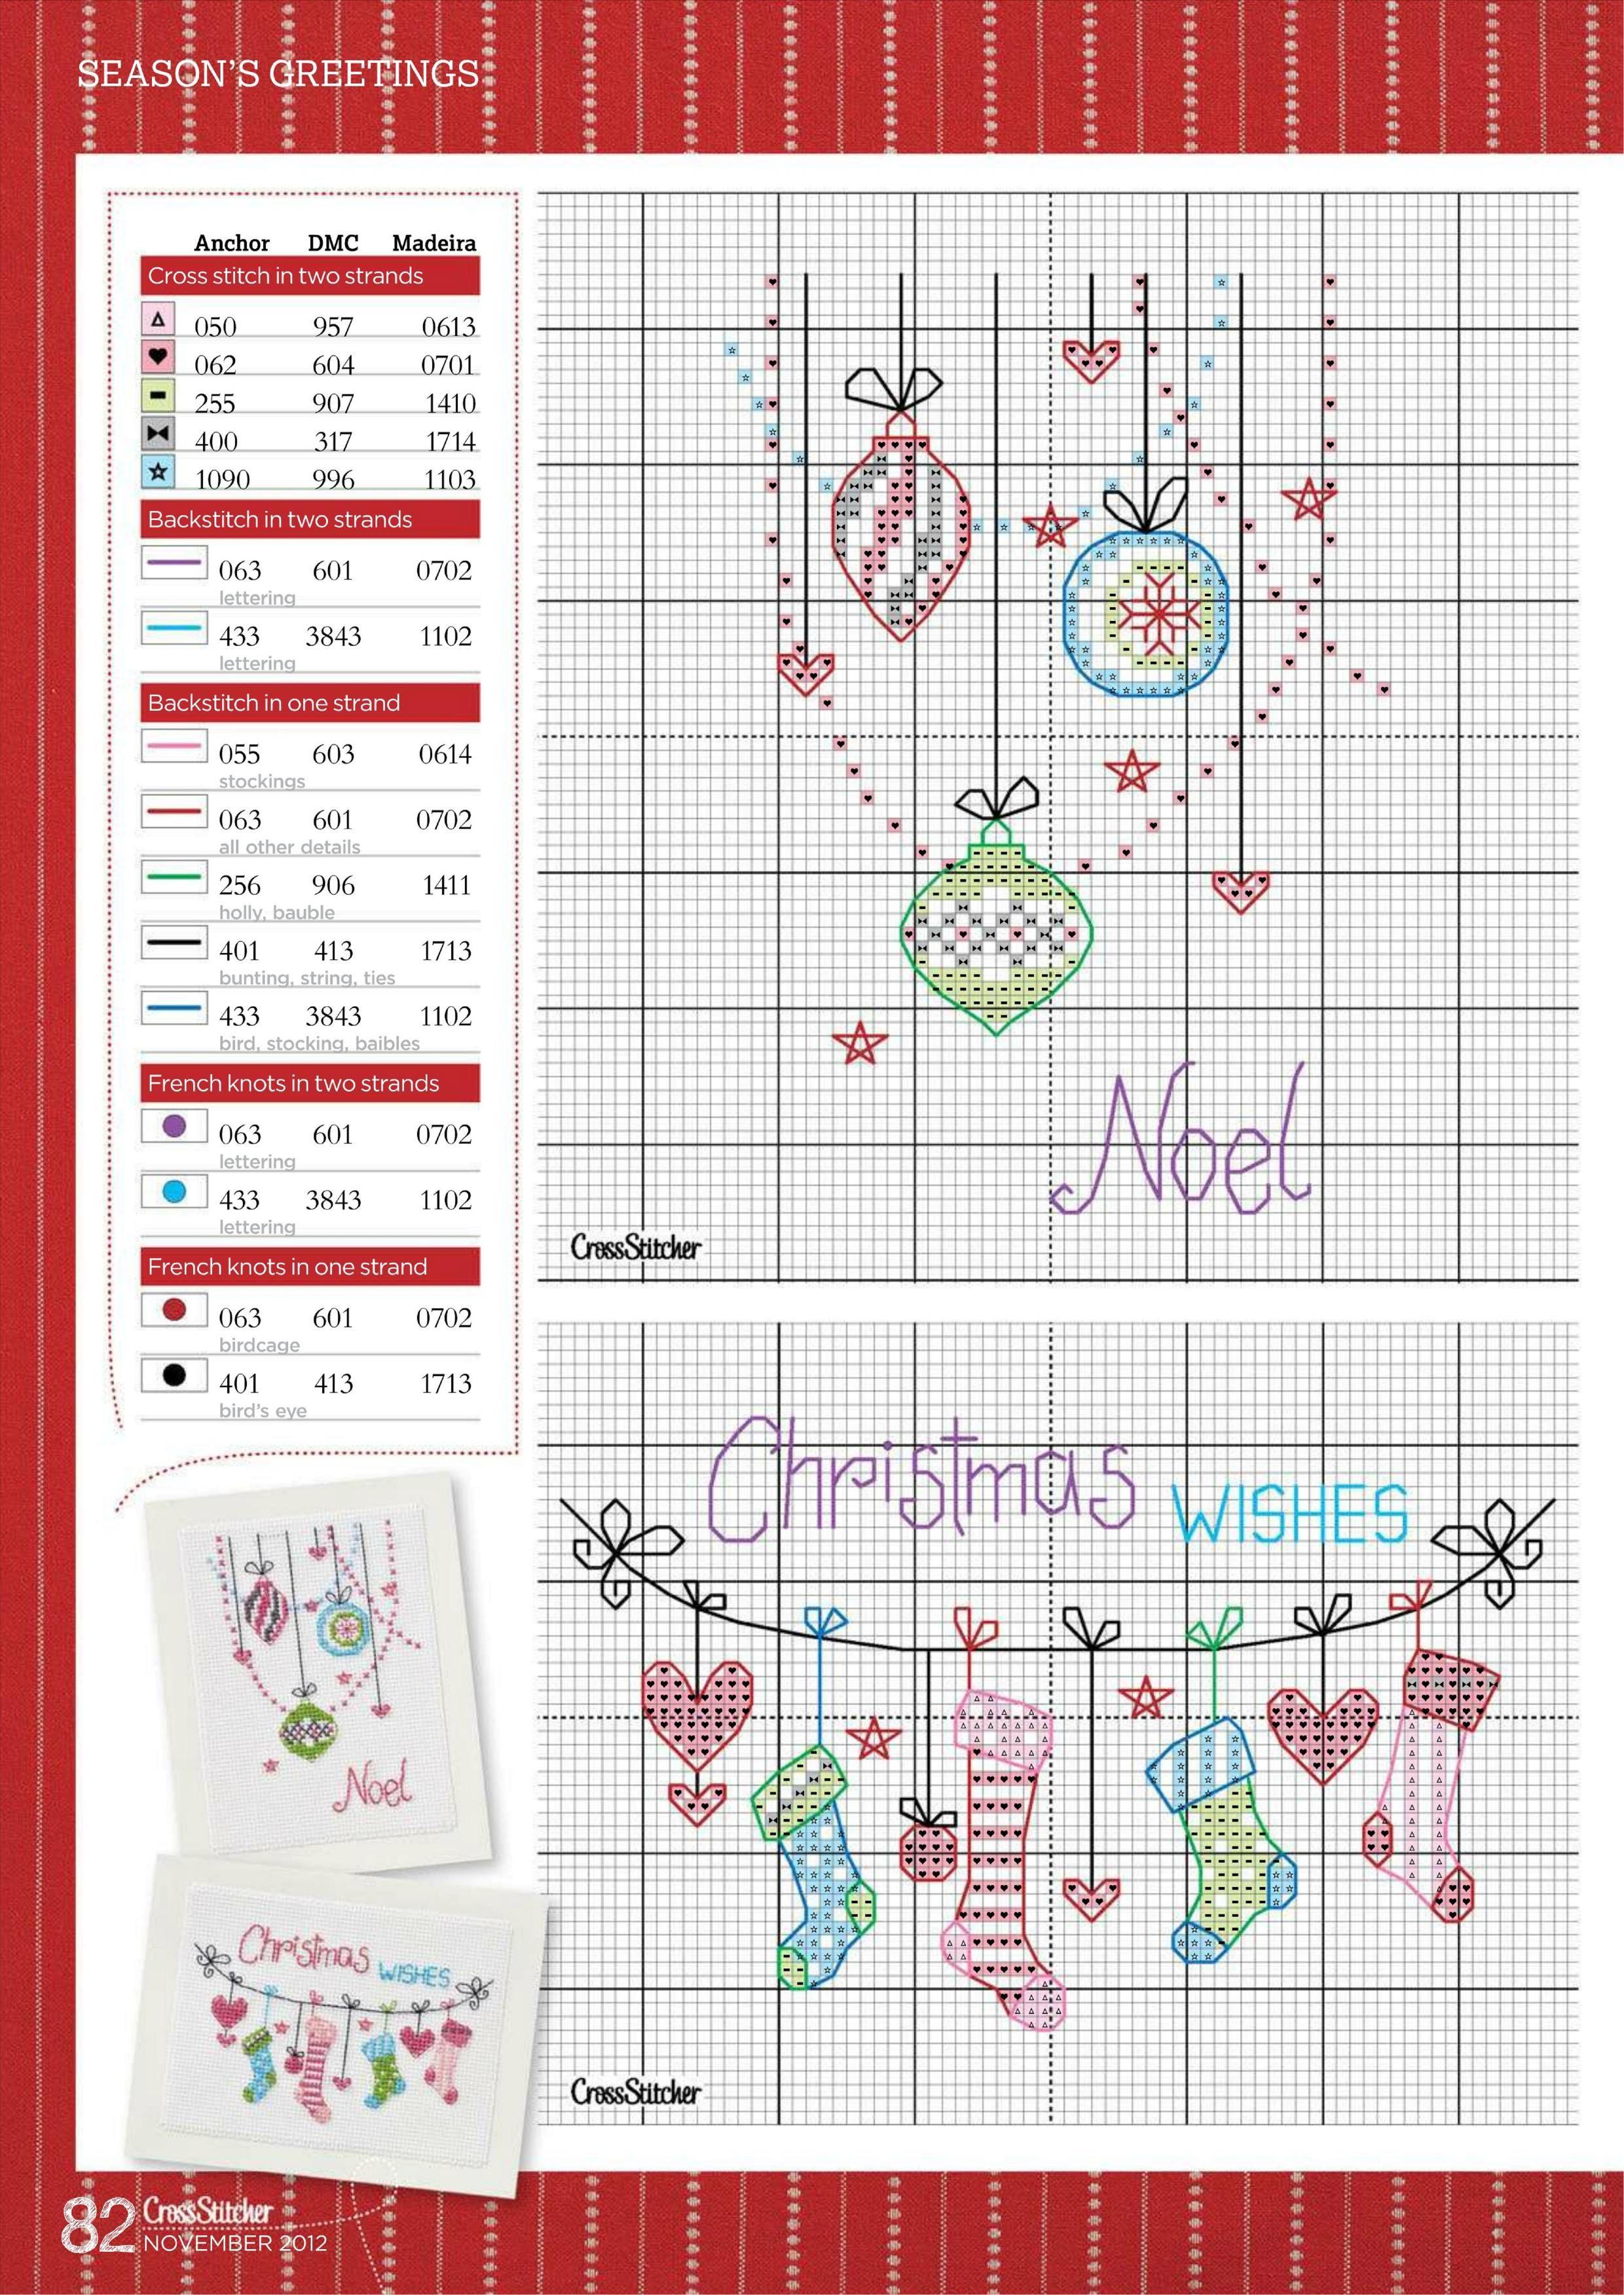 imgbox - fast, simple image host | borduren | Pinterest | Punto de ...